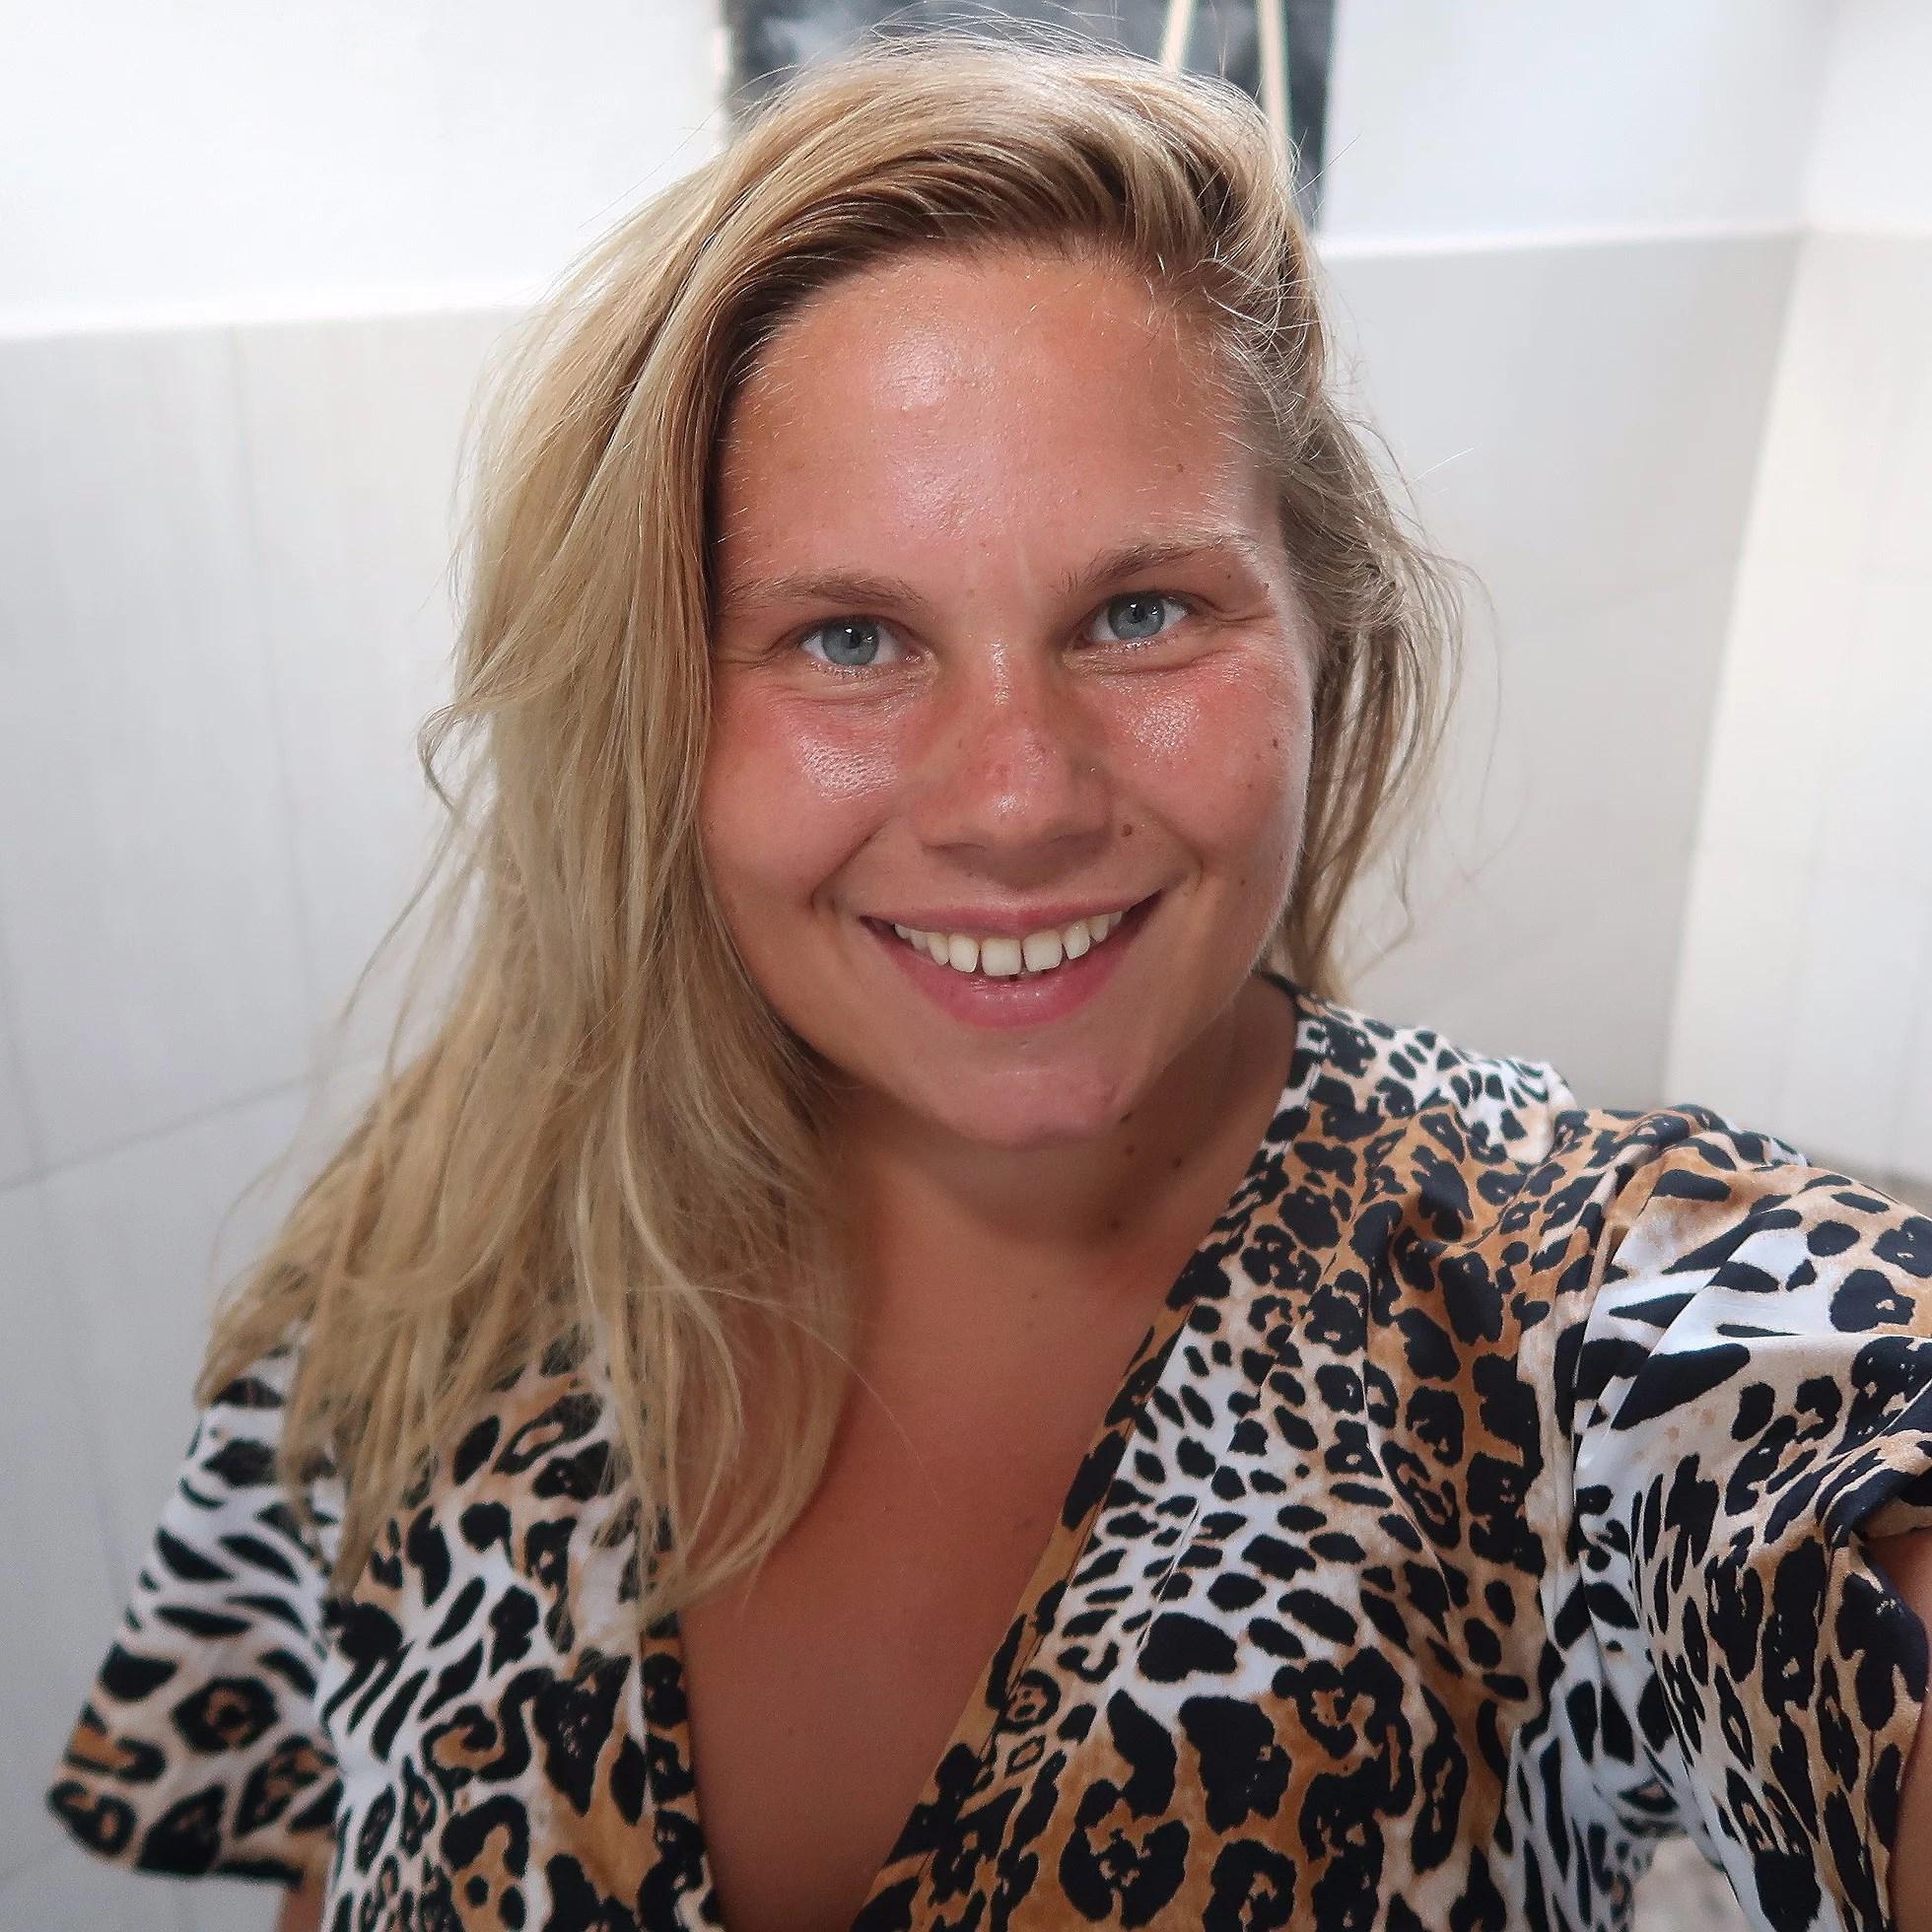 Leopardmönstrat